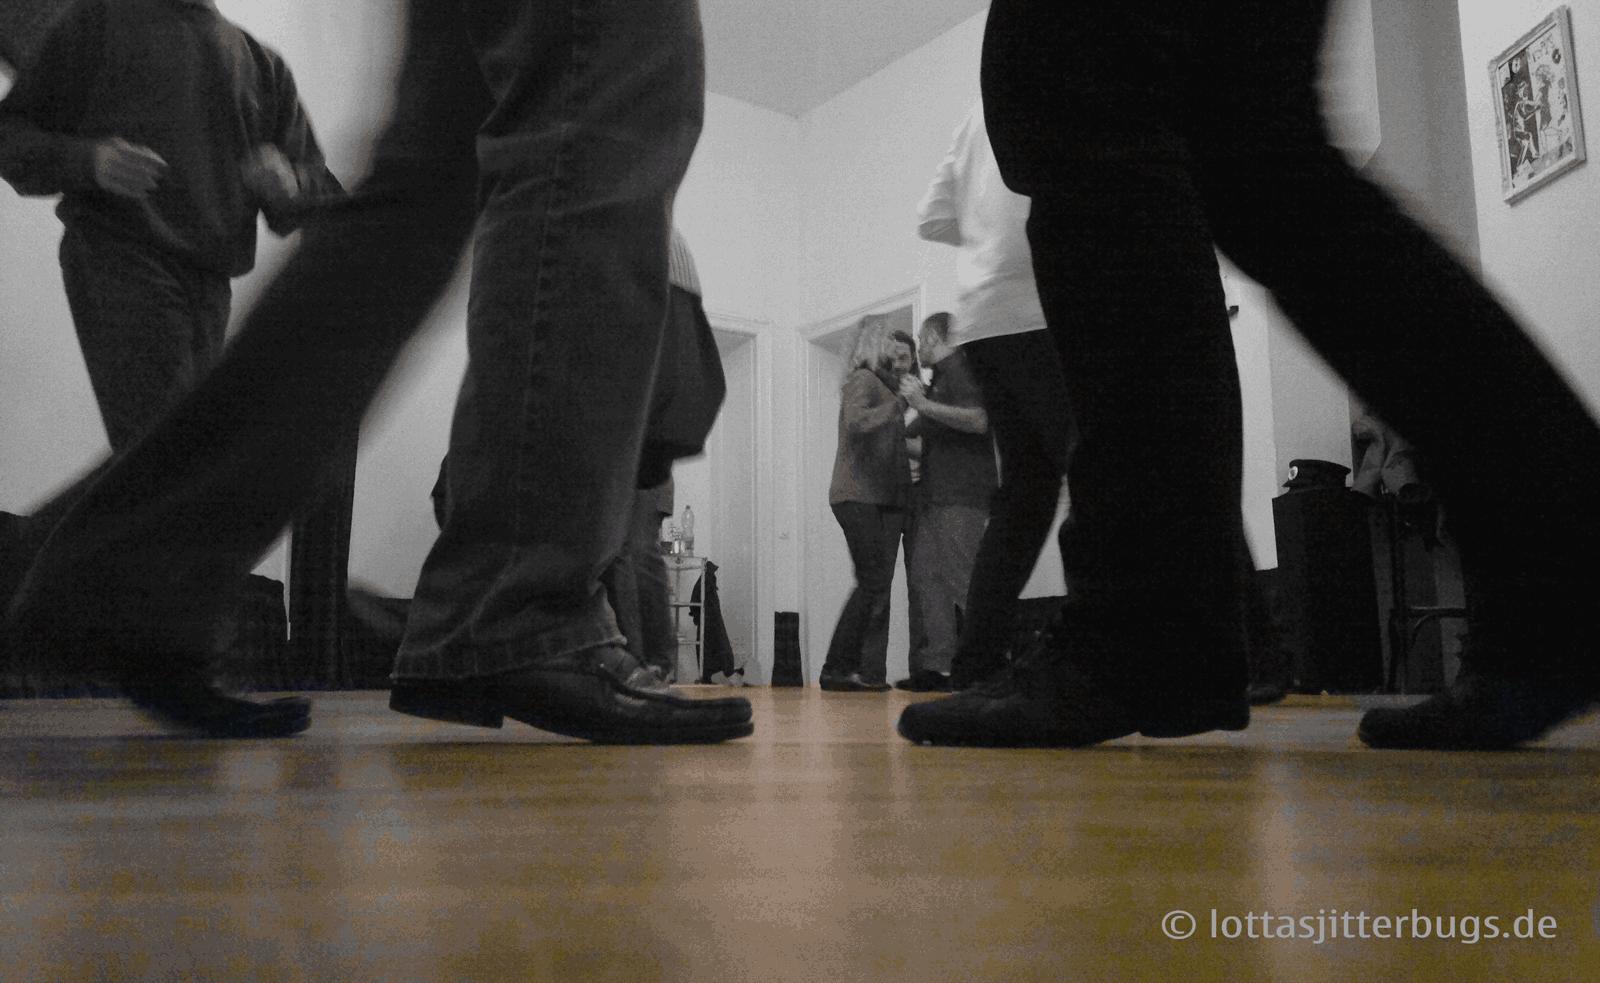 Balboa-Basics_LottasJitterbugs-2013-01